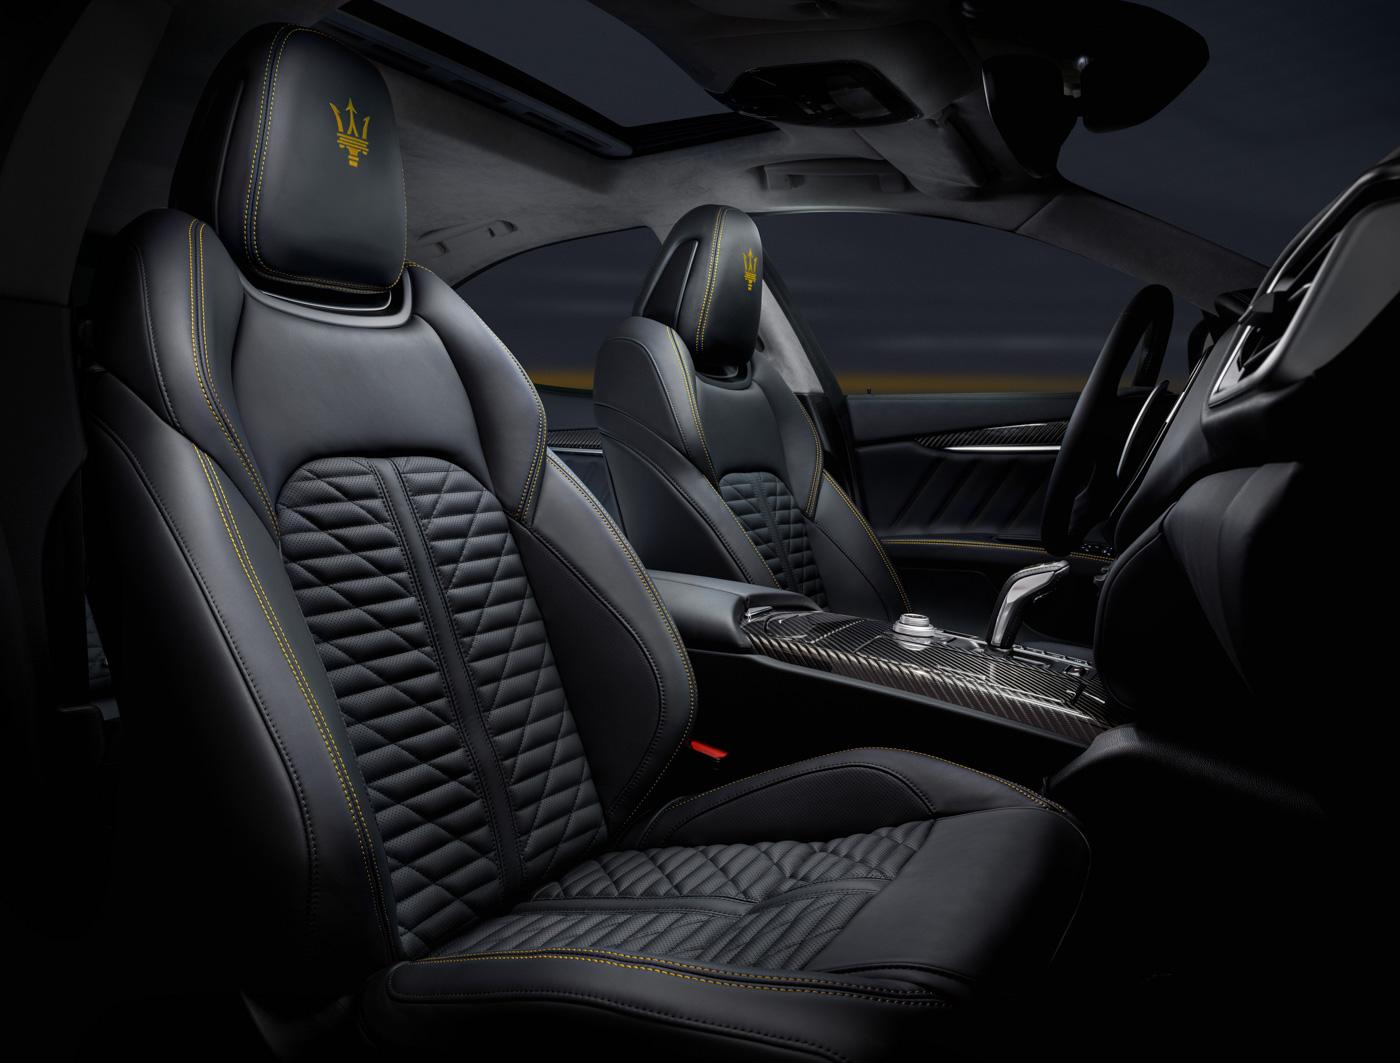 Maserati-F-Tributo-Collection-14.jpg